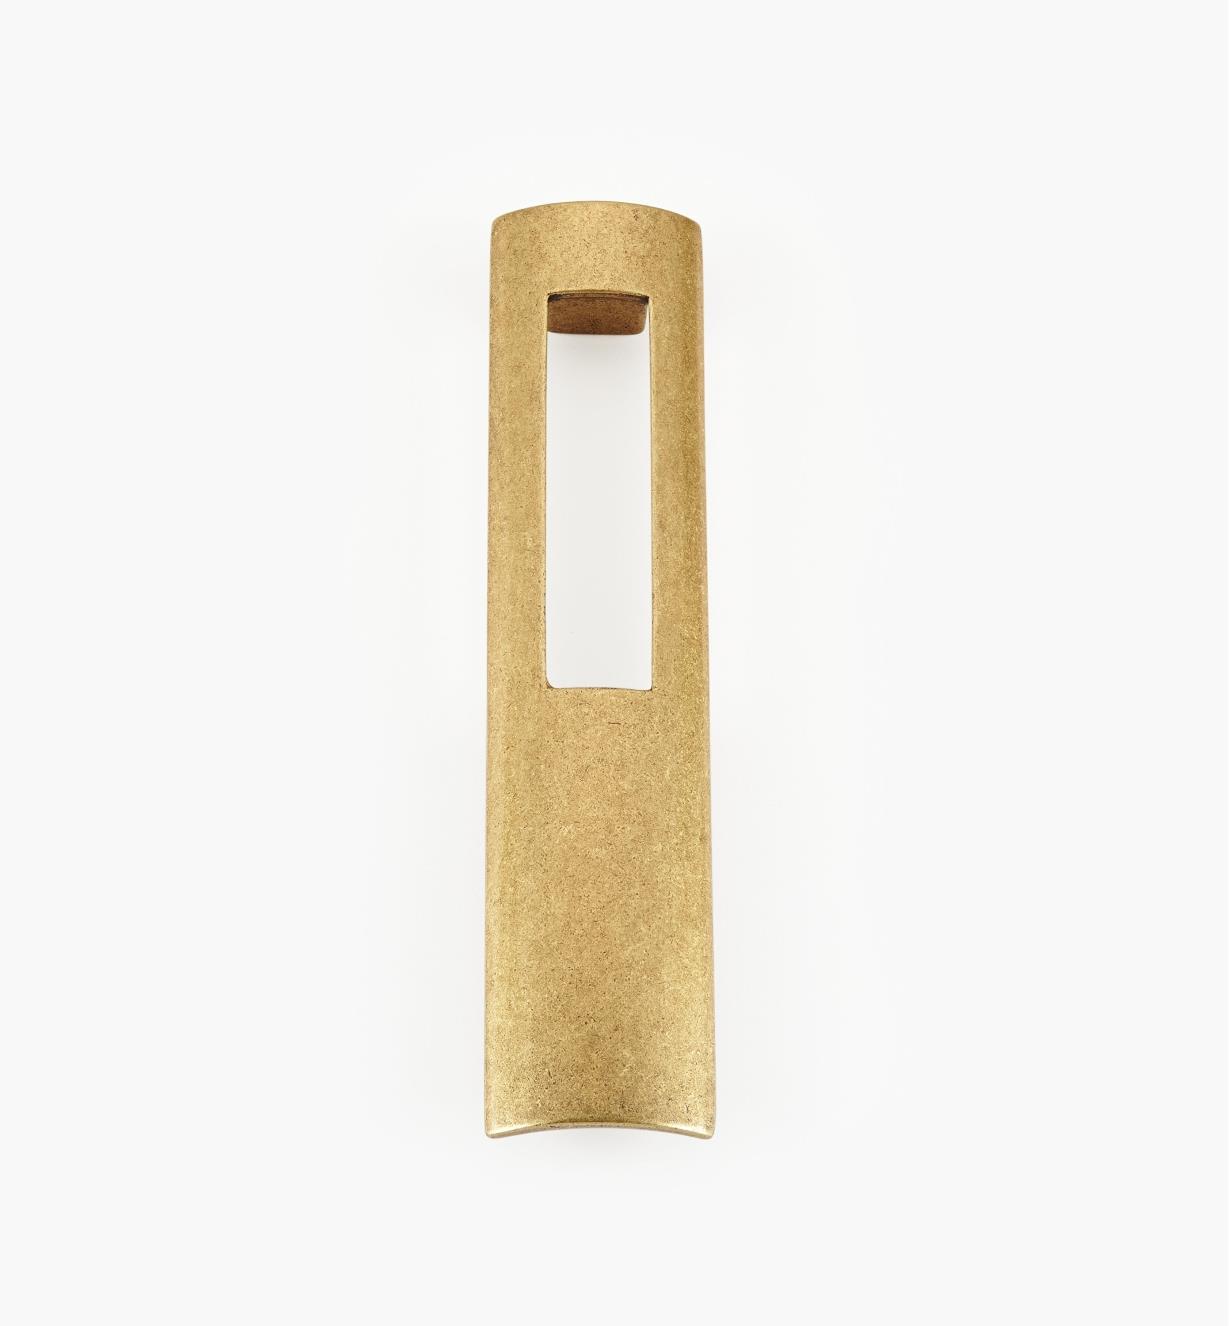 01G1923 - 128mm x 152mm Antique Brass Portal Pull